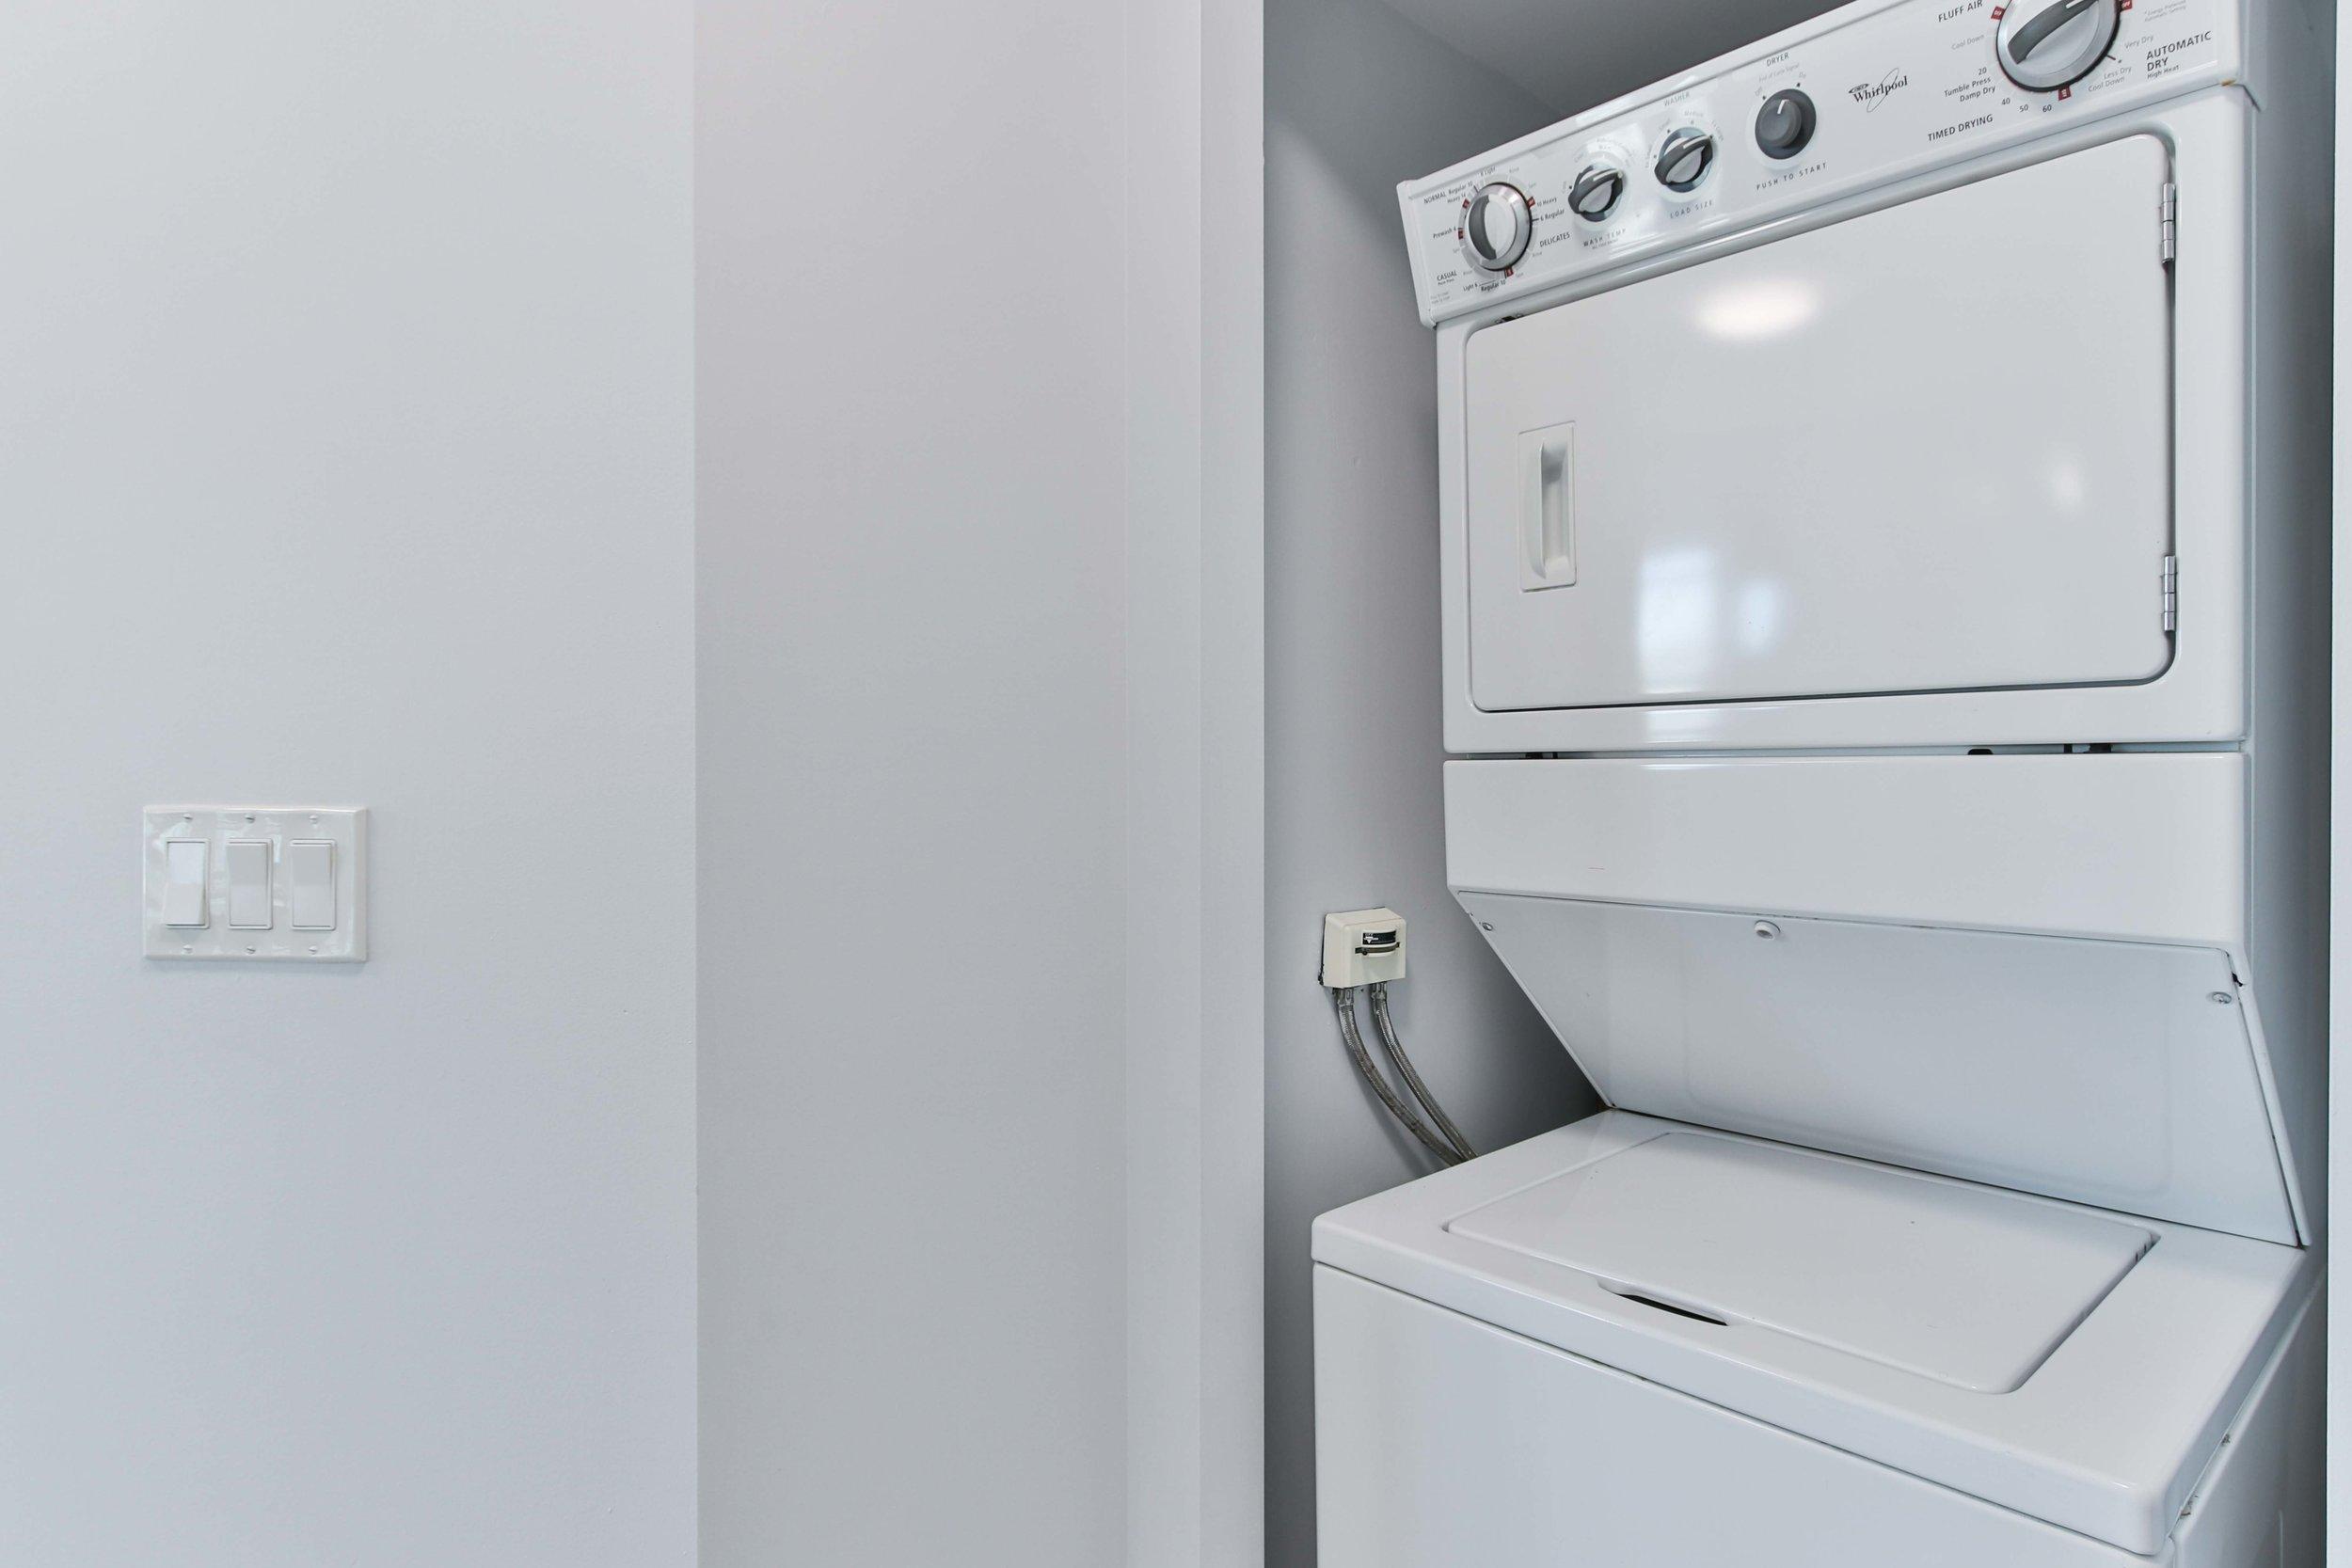 33_Laundry.jpg